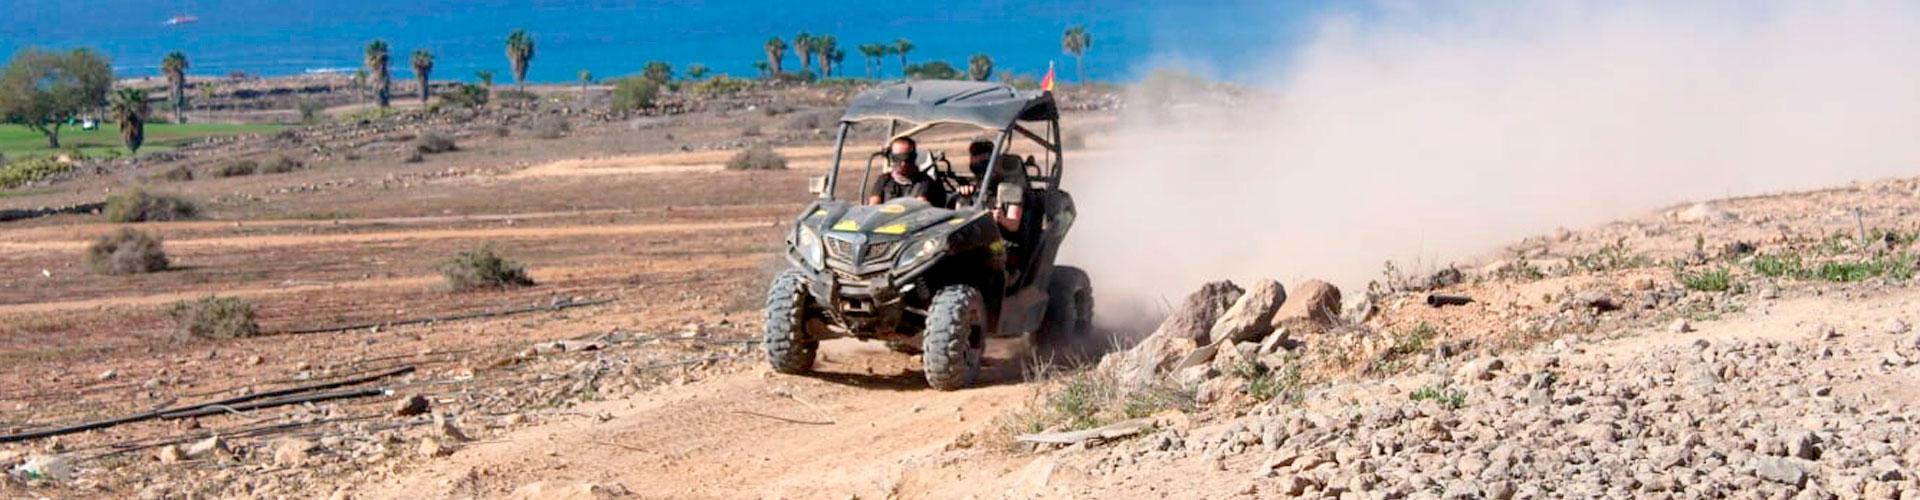 Safari Buggy Tenerife